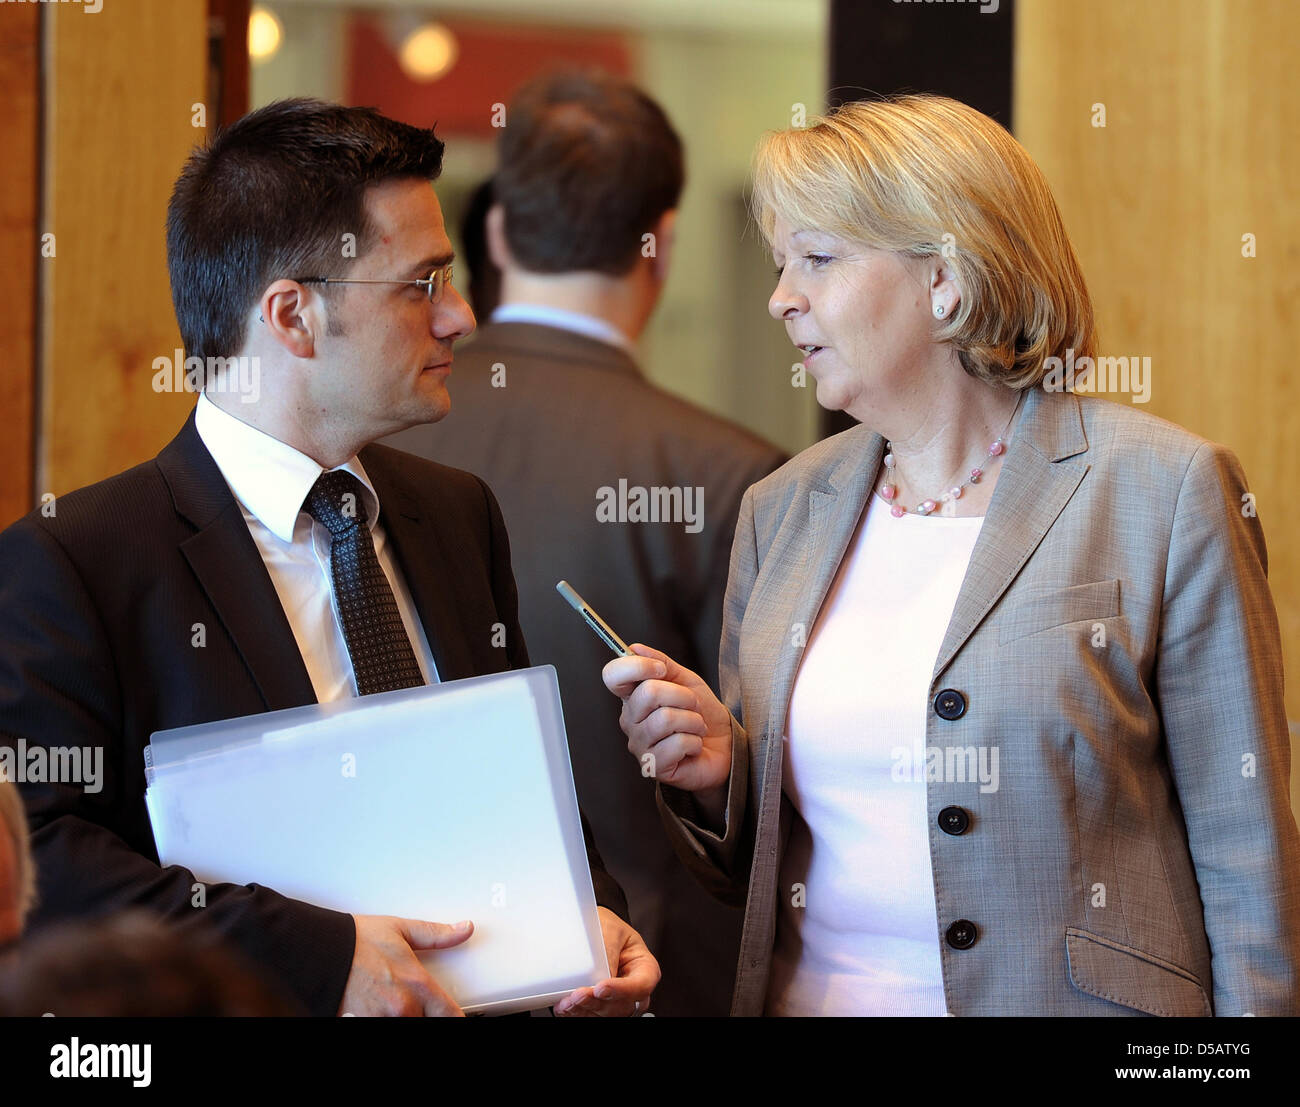 The Premier of North Rhine-Westphalia, Hannelore Kraft (R), speaks to North Rhine-Westphalia's Minister of Finance, - Stock Image